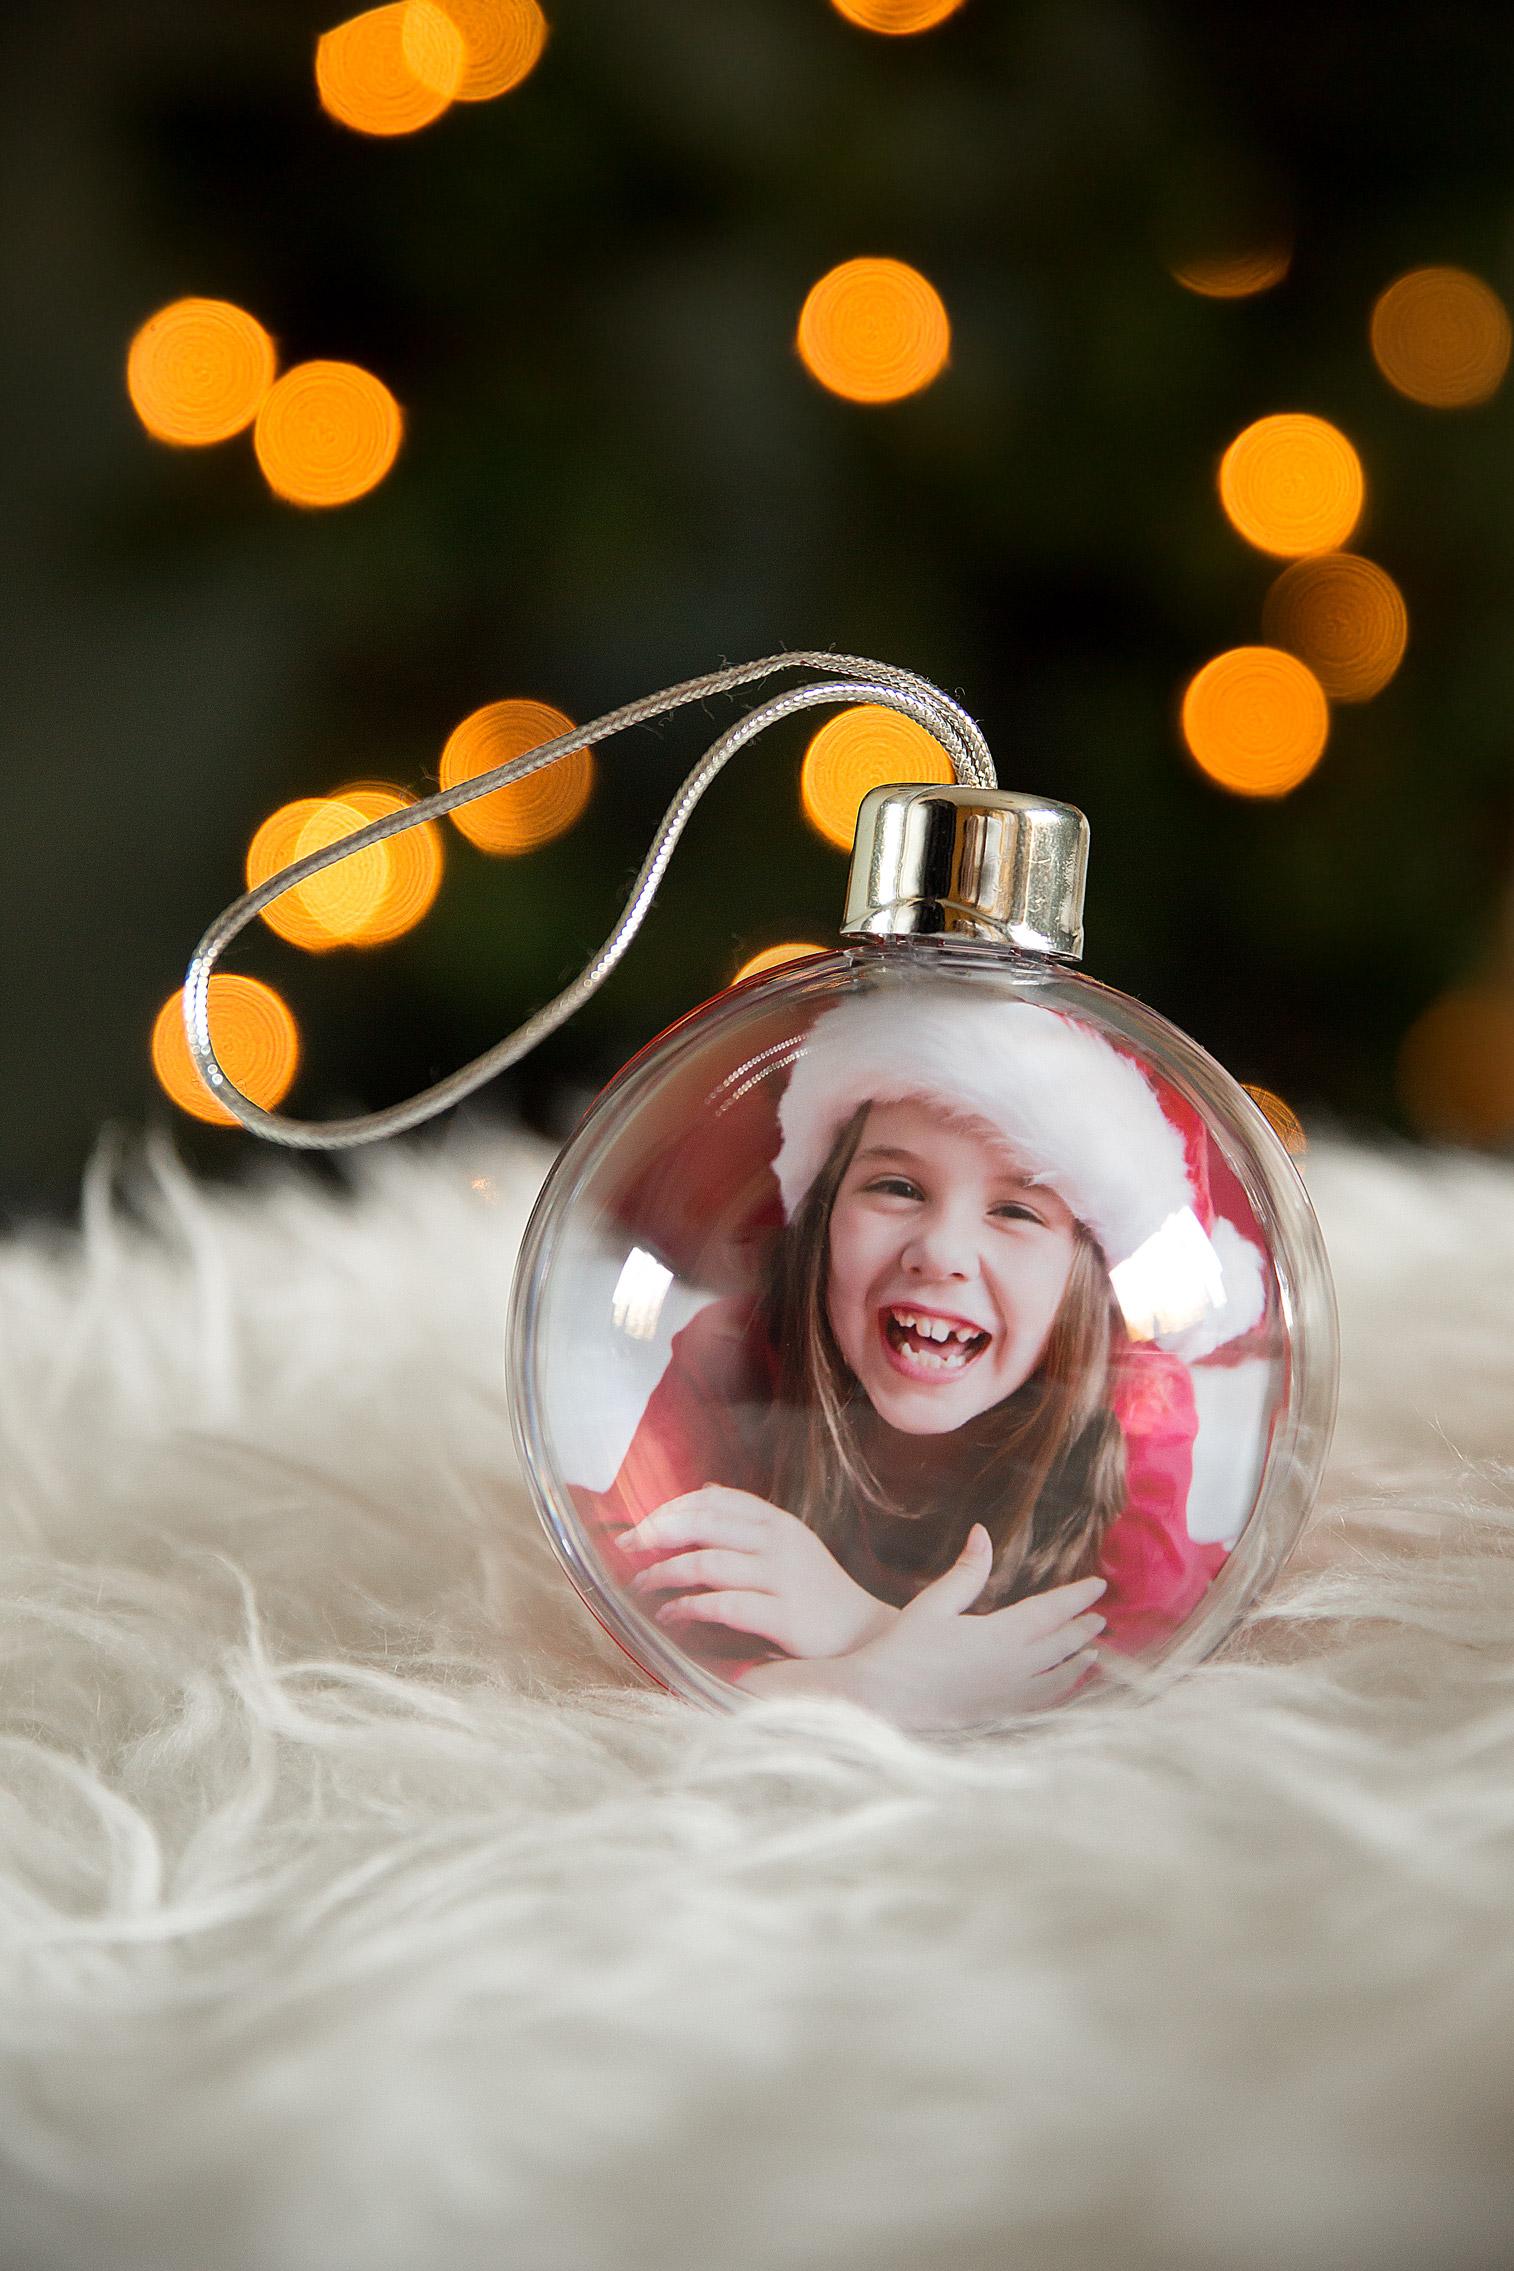 Christmas-limited-edition-gifts-hemel-hempstead